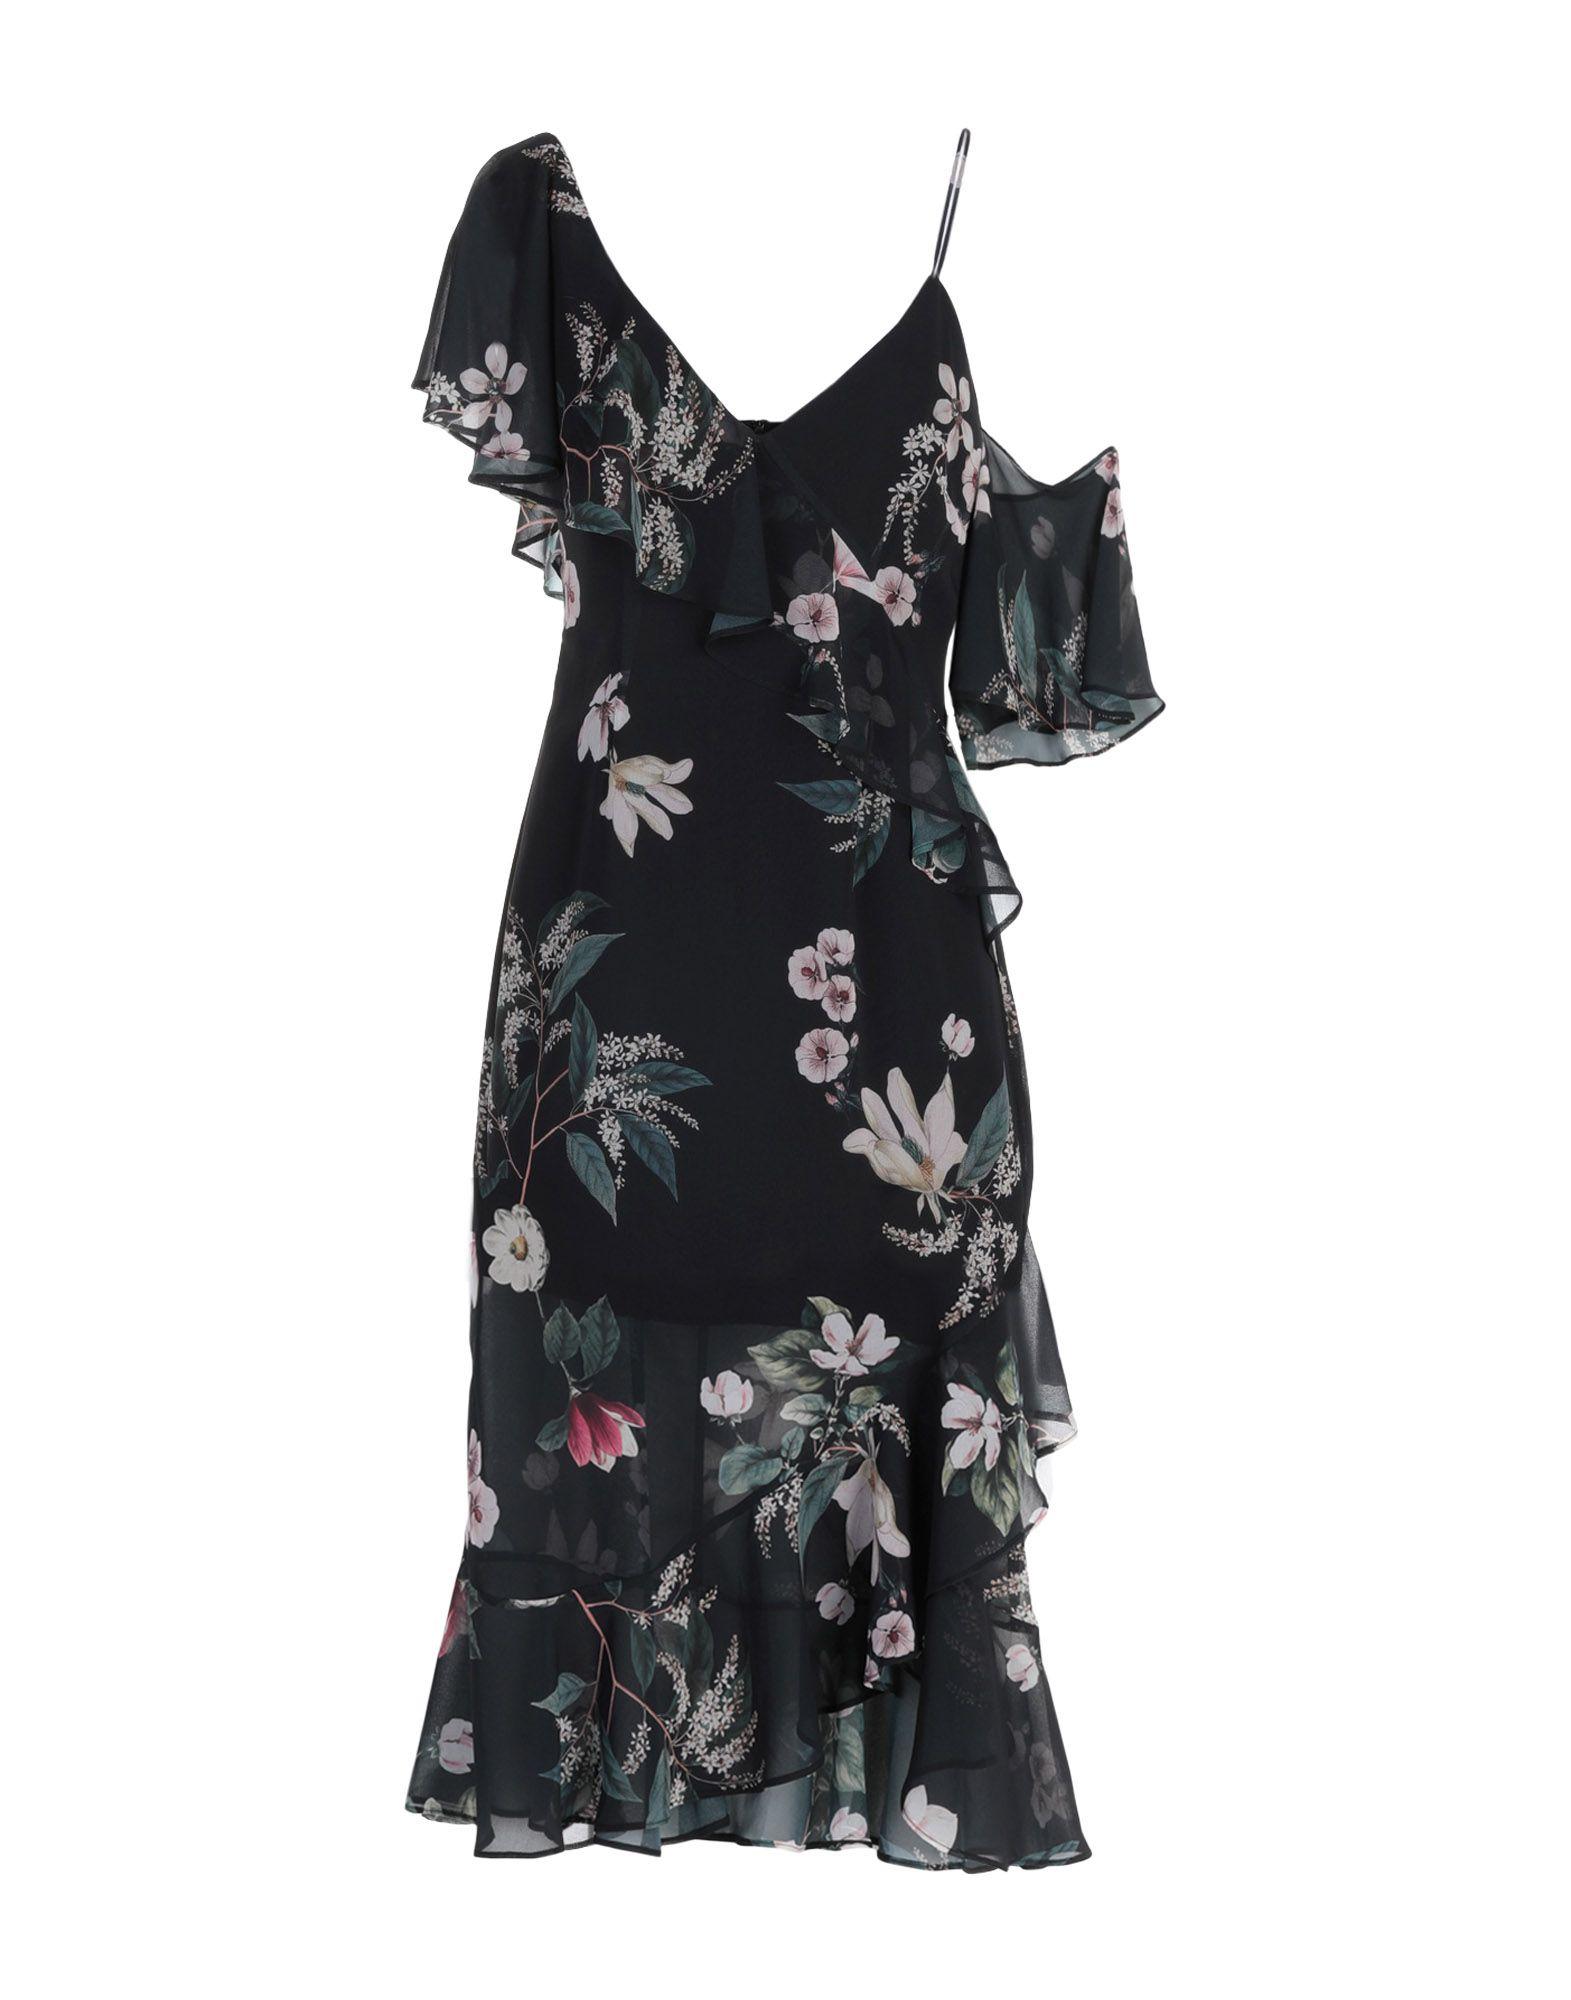 AKÈ - Γυναικεία Μίντι Φορέματα  081a430975c